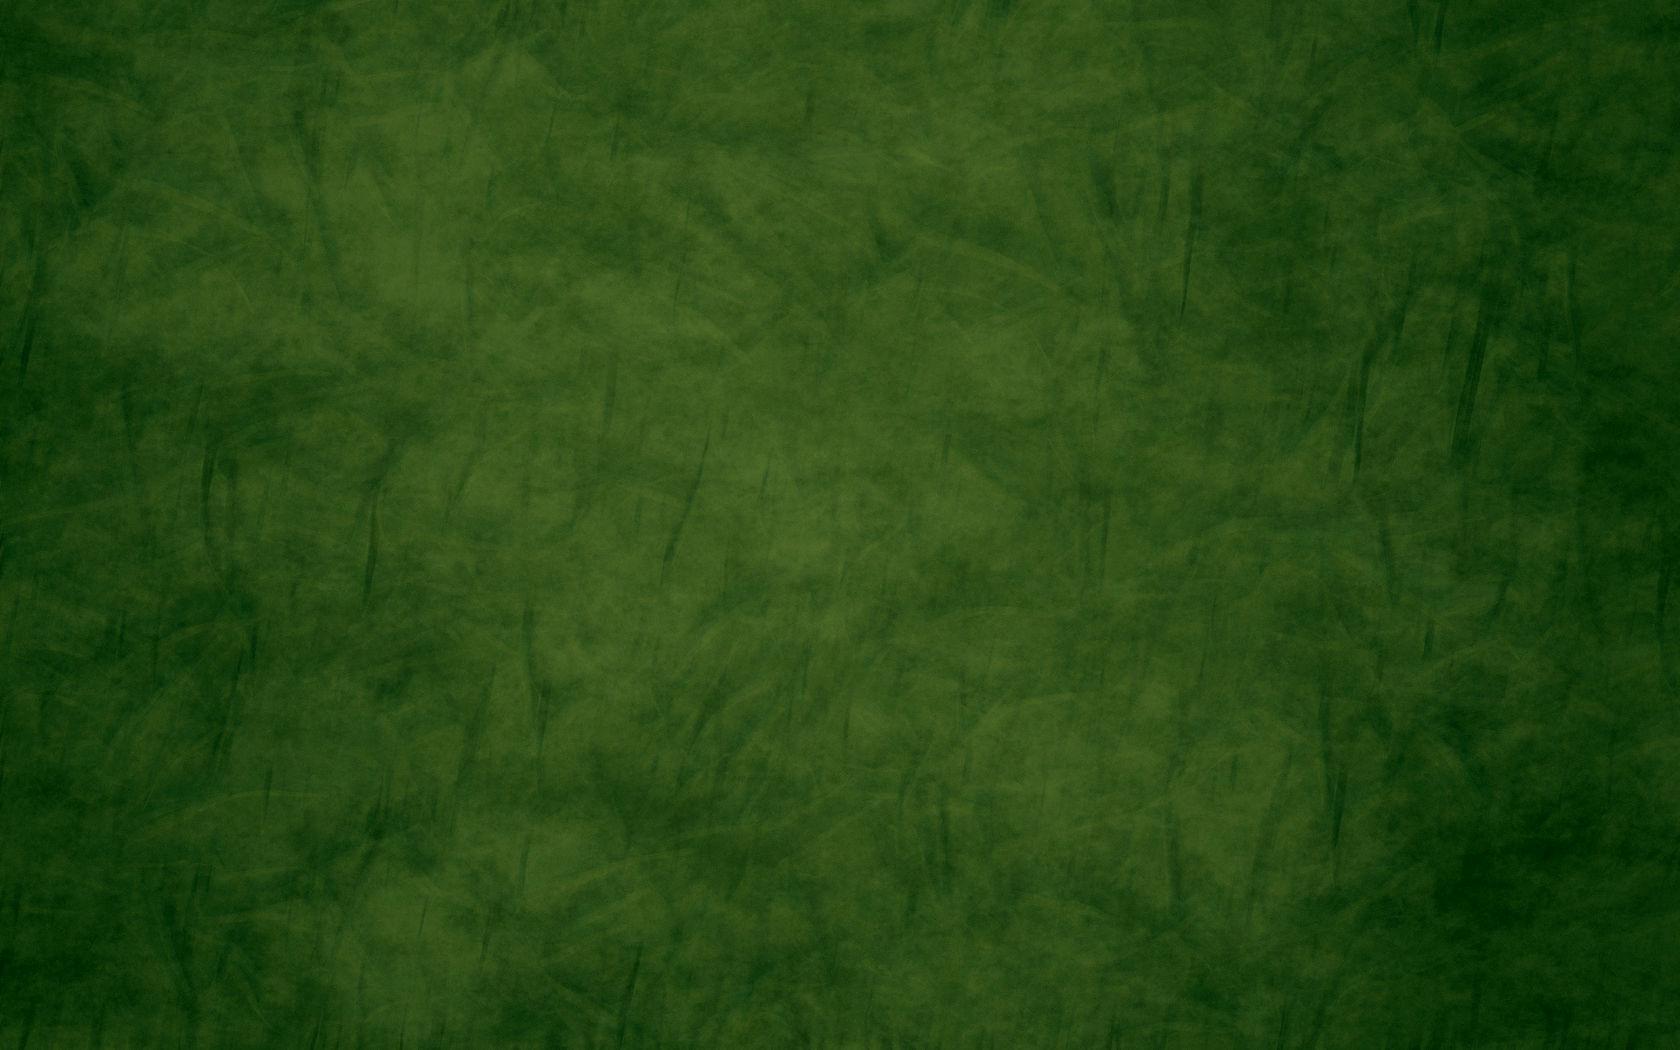 blurry_grass_green by 10r